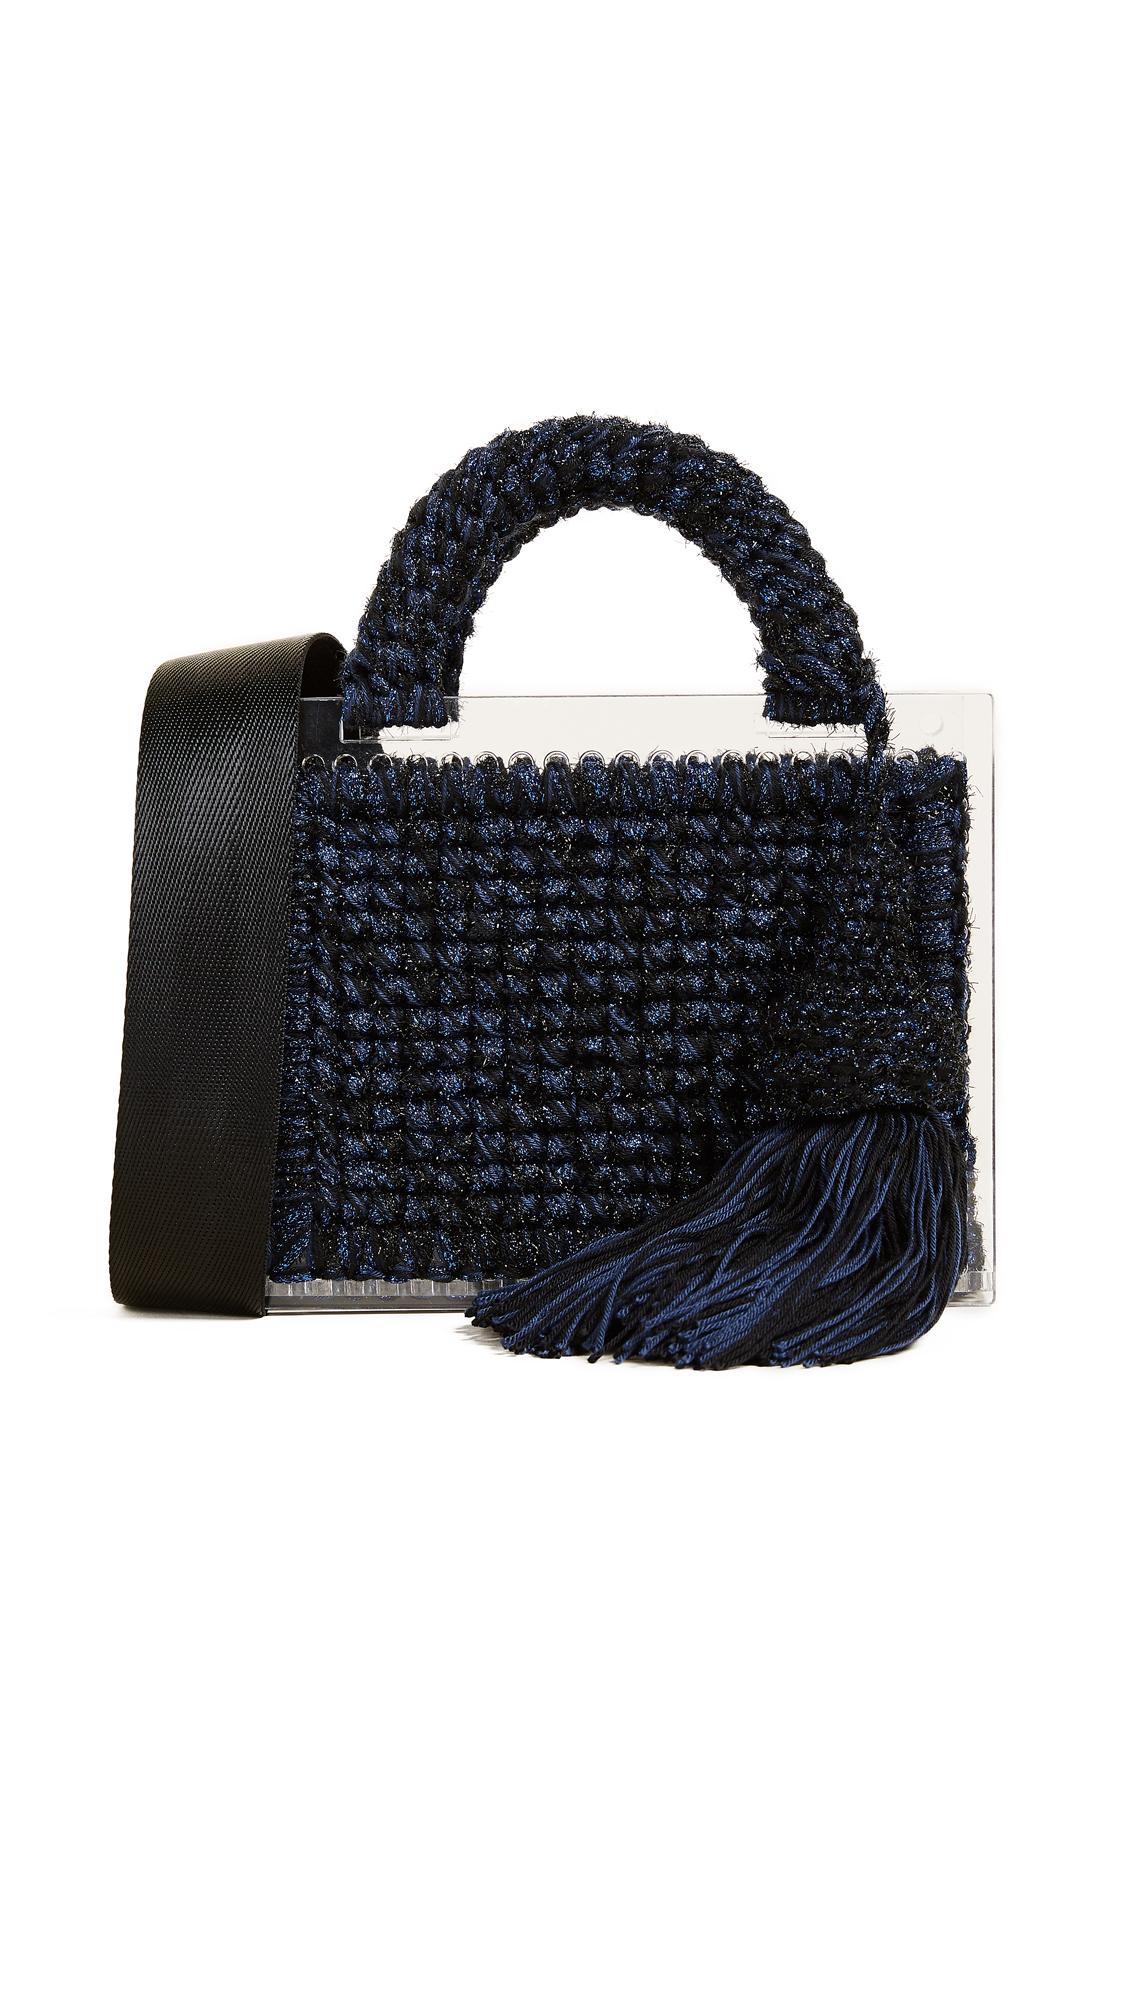 0711 Lyudmila St. Barts Purse - Blue/Black